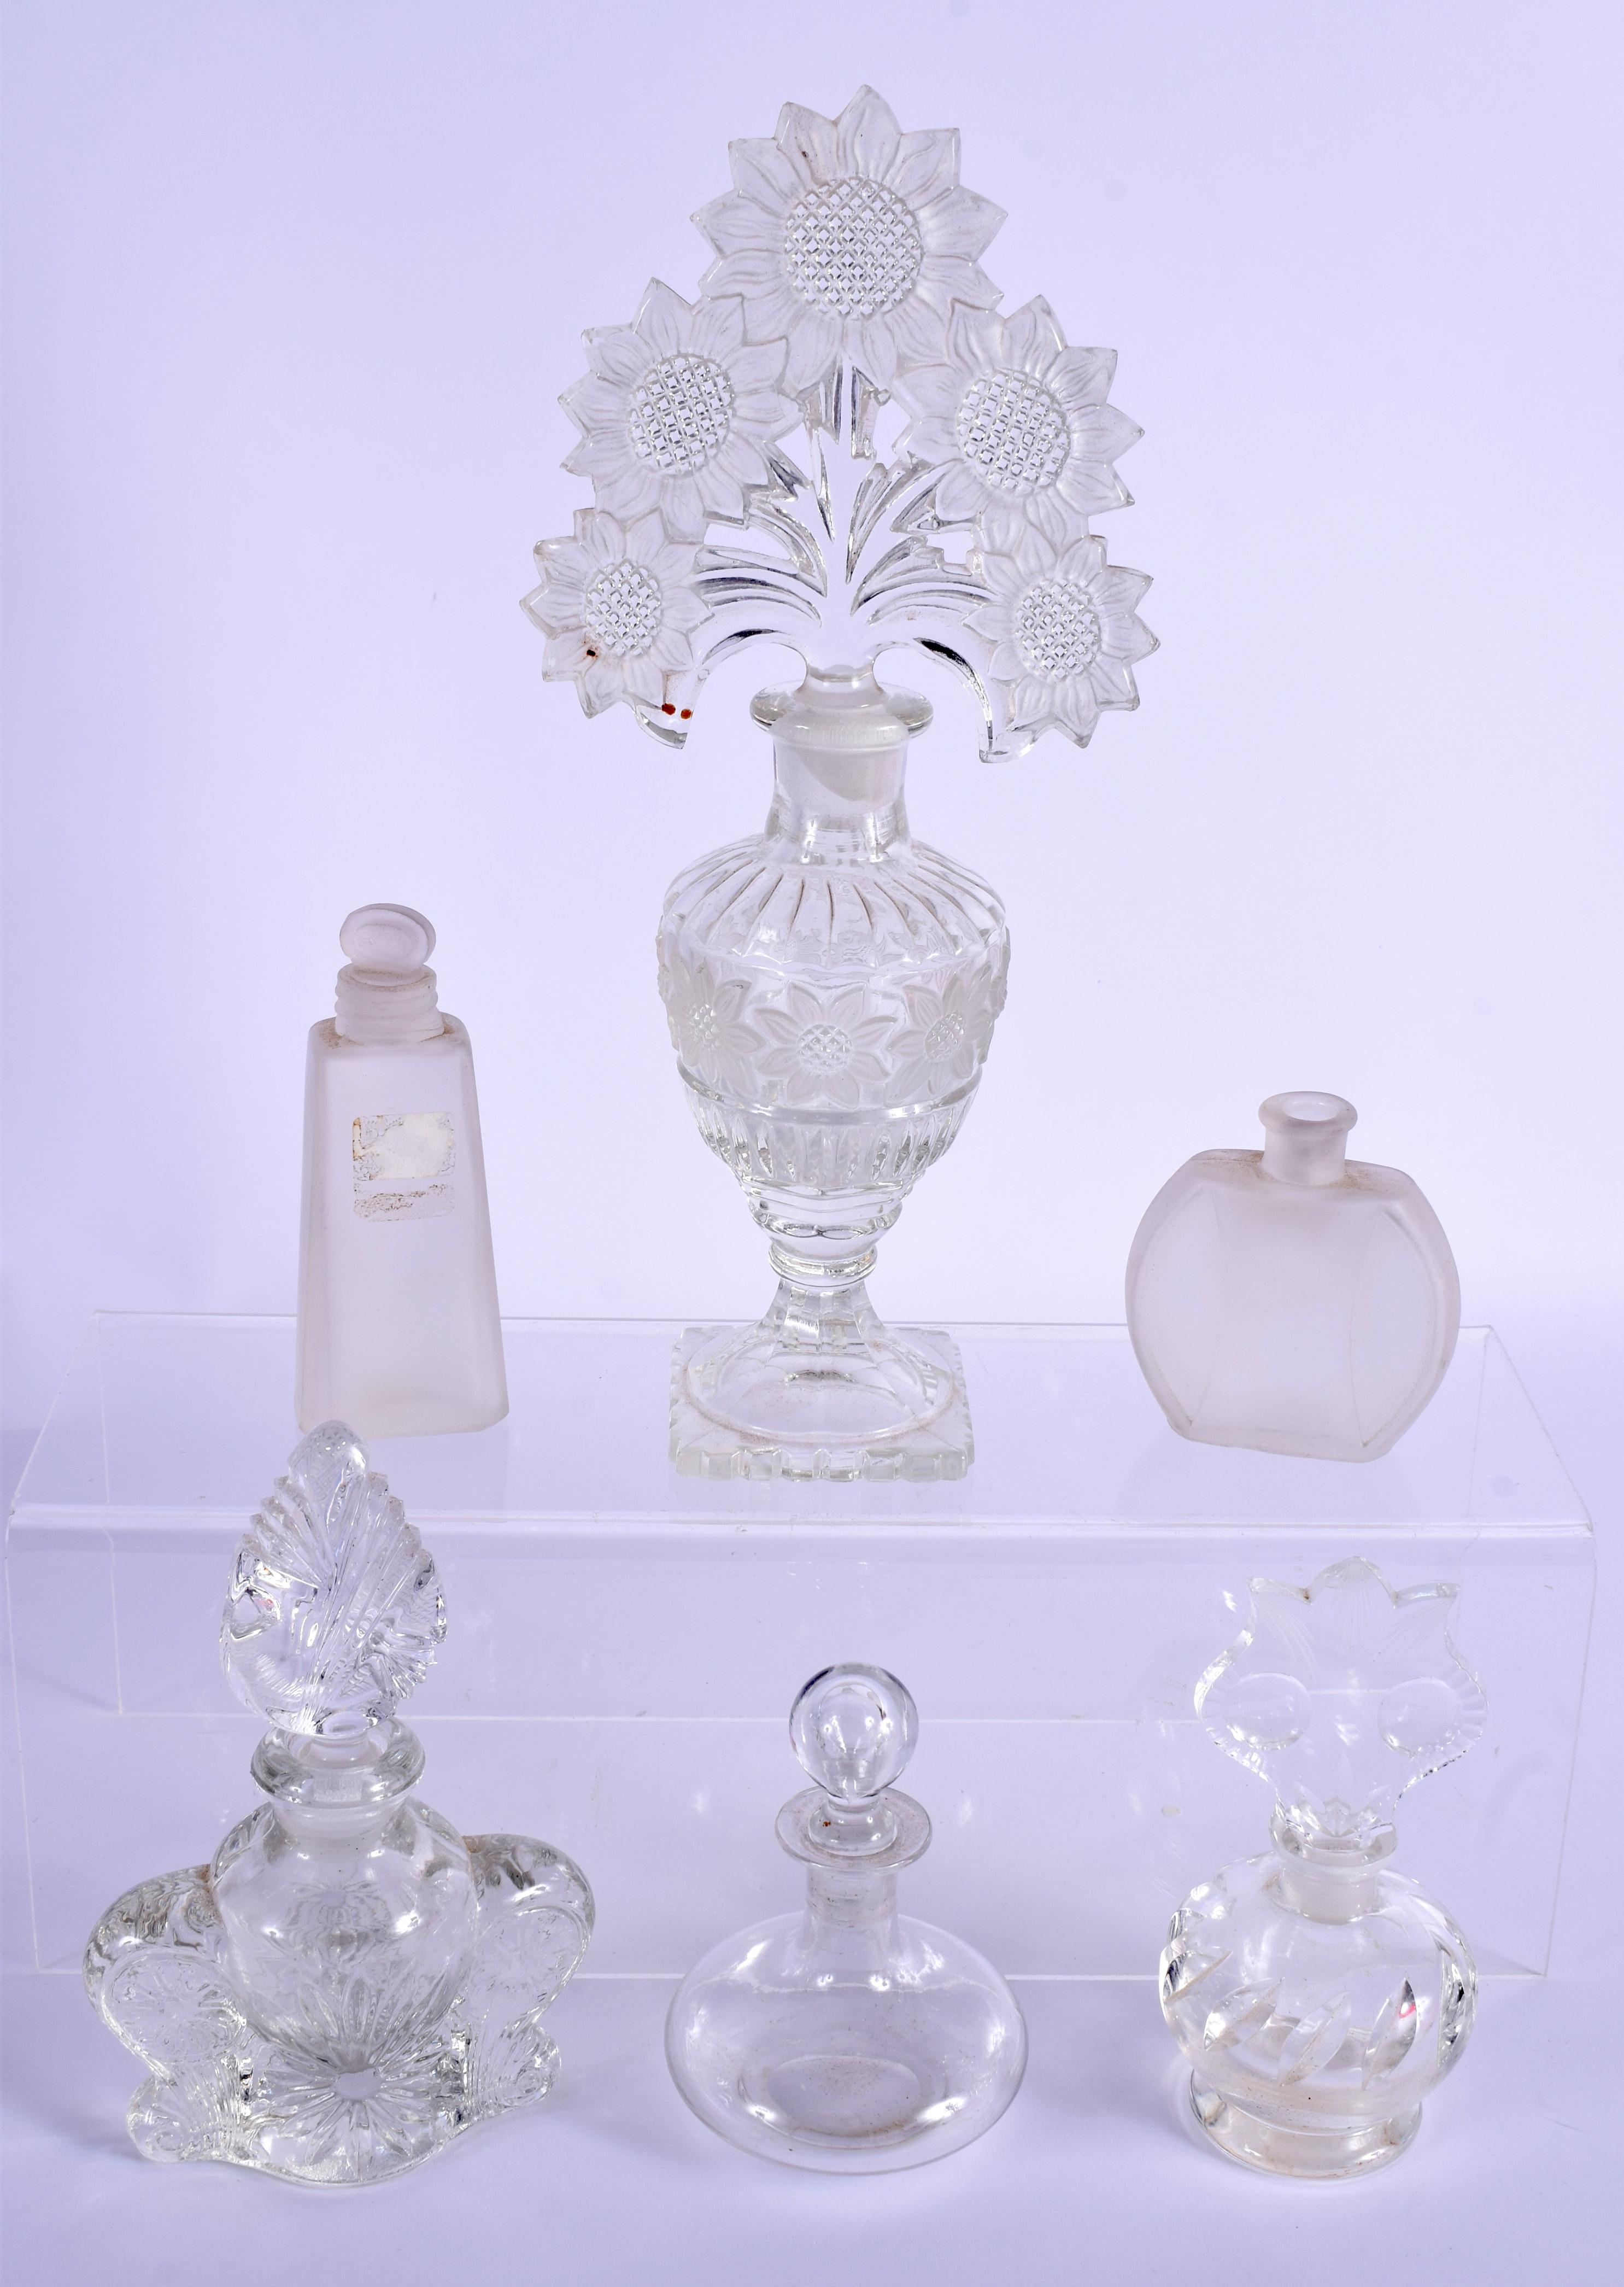 SIX ART DECO GLASS SCENT BOTTLES. Largest 15 cm high. (6) - Image 2 of 2